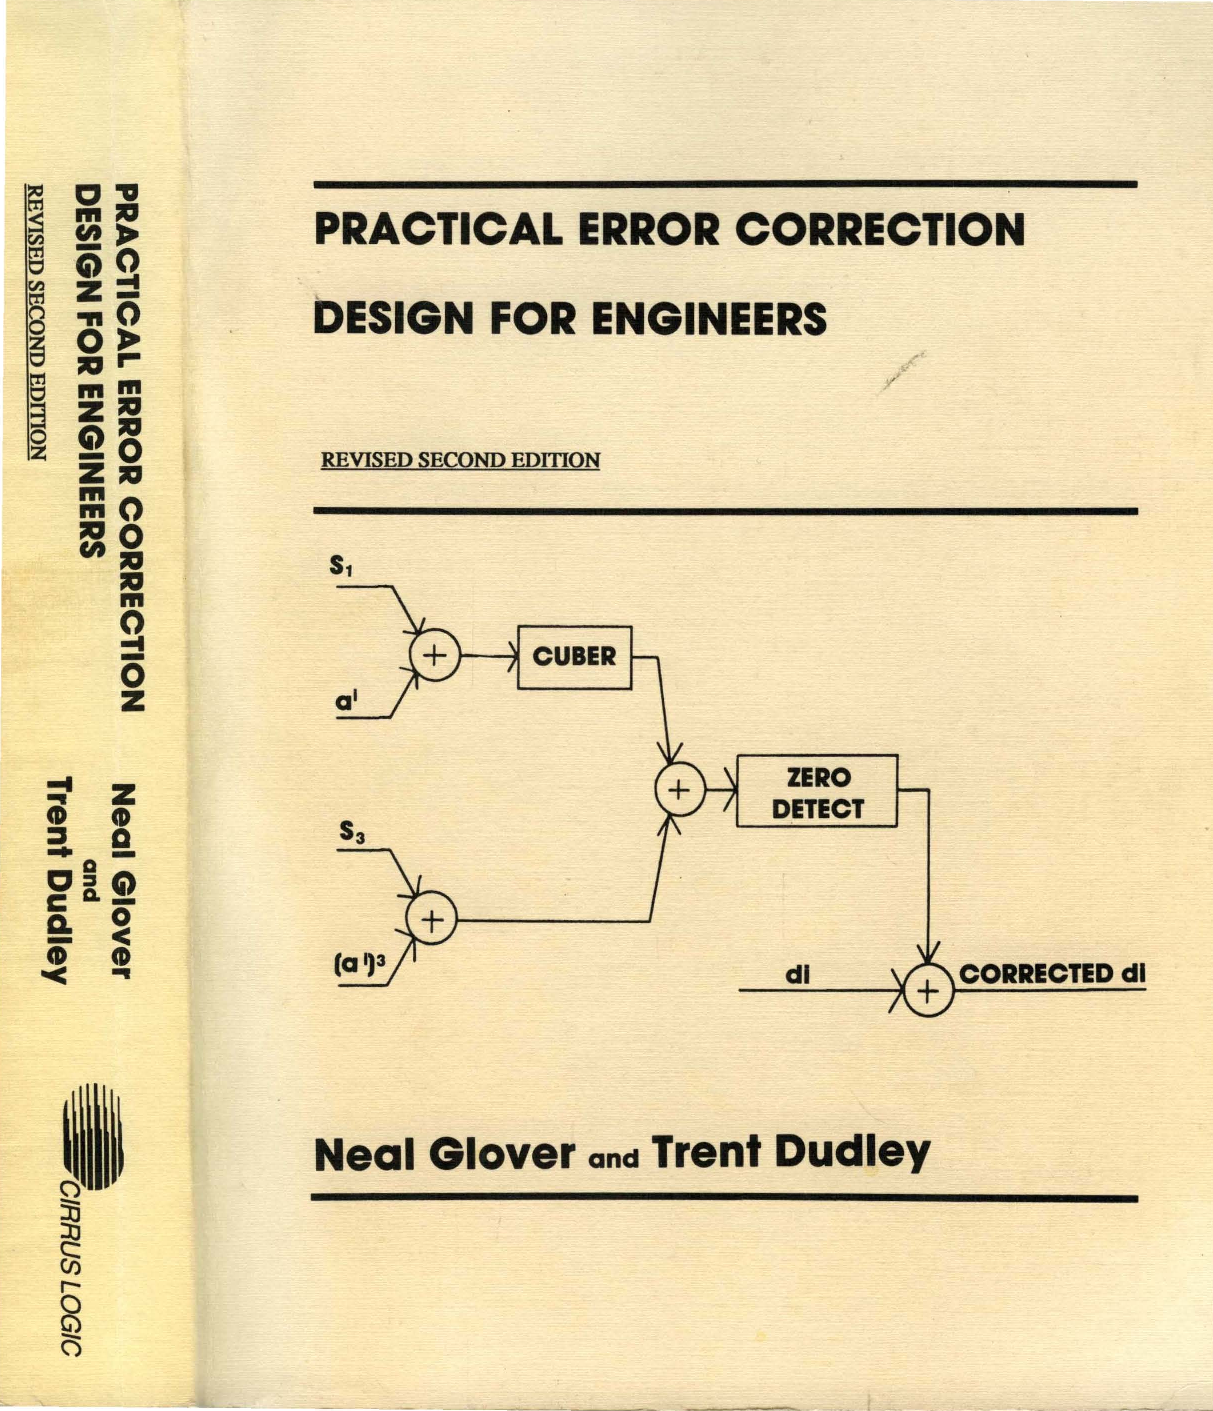 Practical_Error Correction_Design_For_Engineers_2ed_1991 Practical